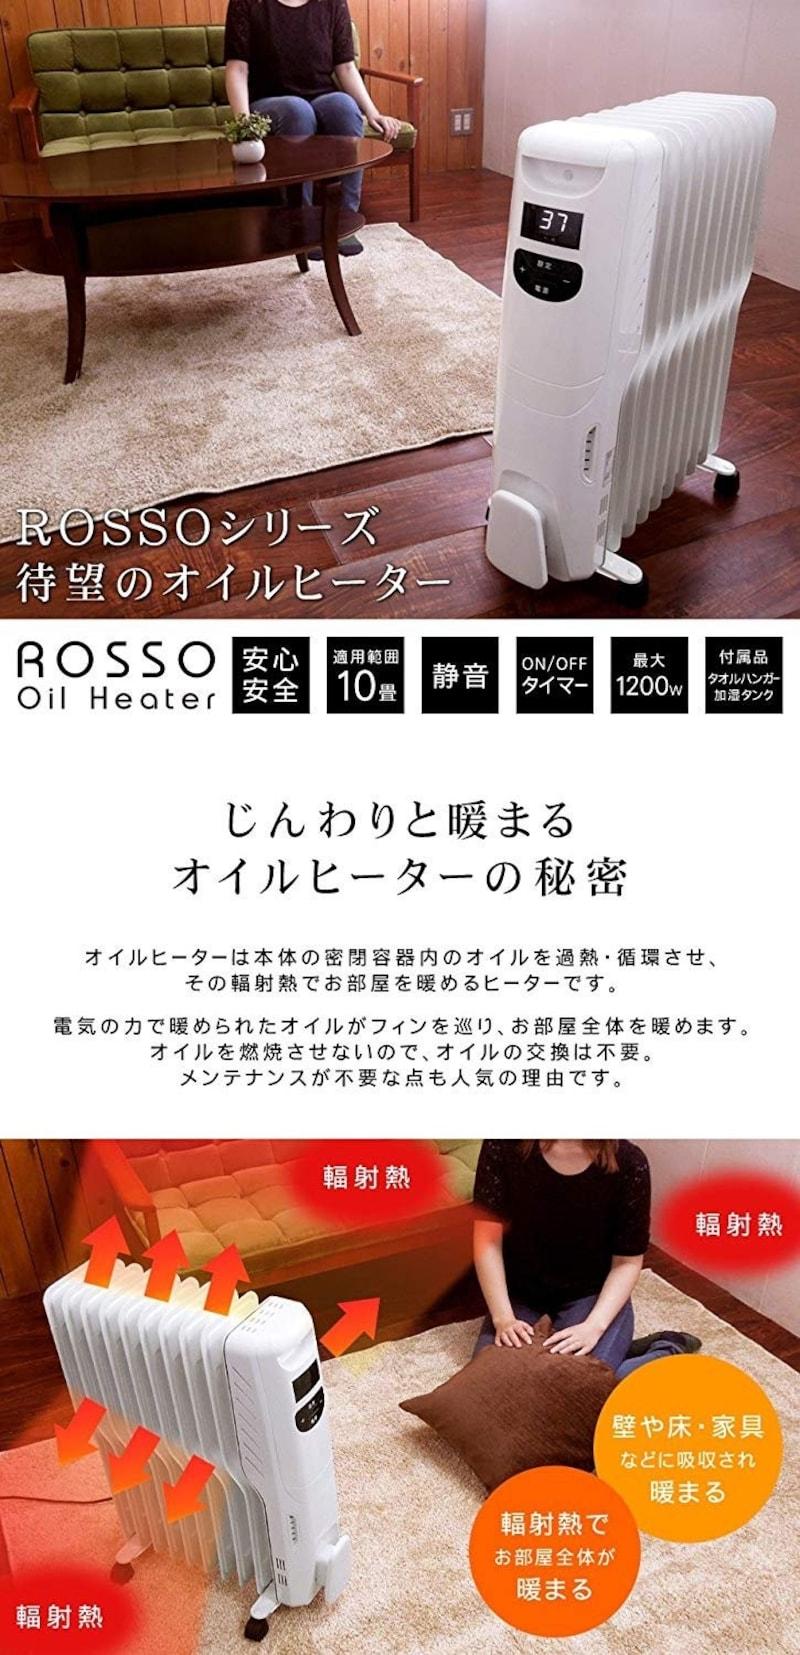 ROSSO(ロッソ),オイルヒーター,EJ-CA041